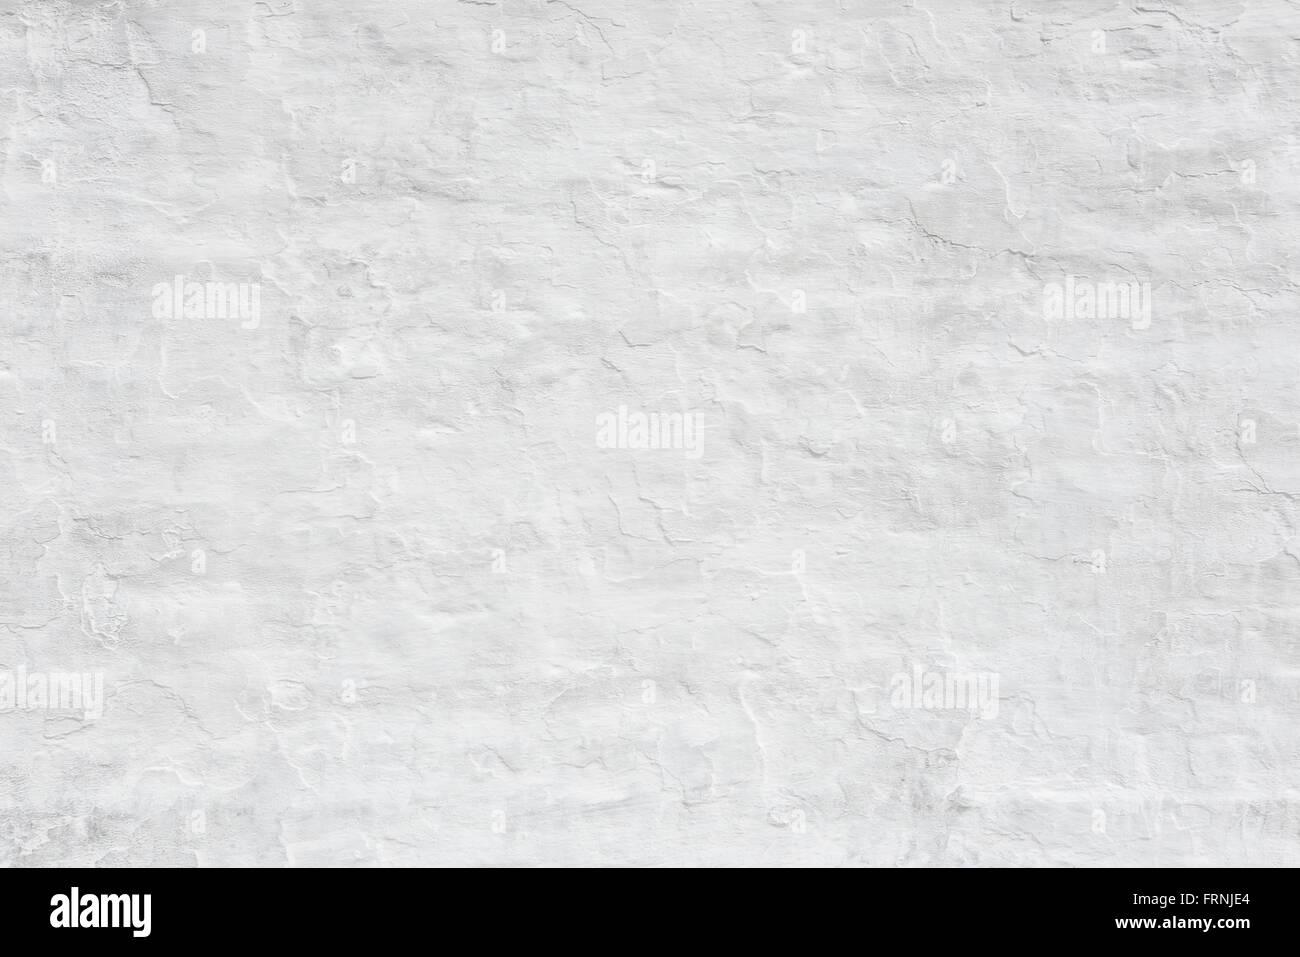 Rough Texture Background: White Rough Wall Texture Stock Photos & White Rough Wall